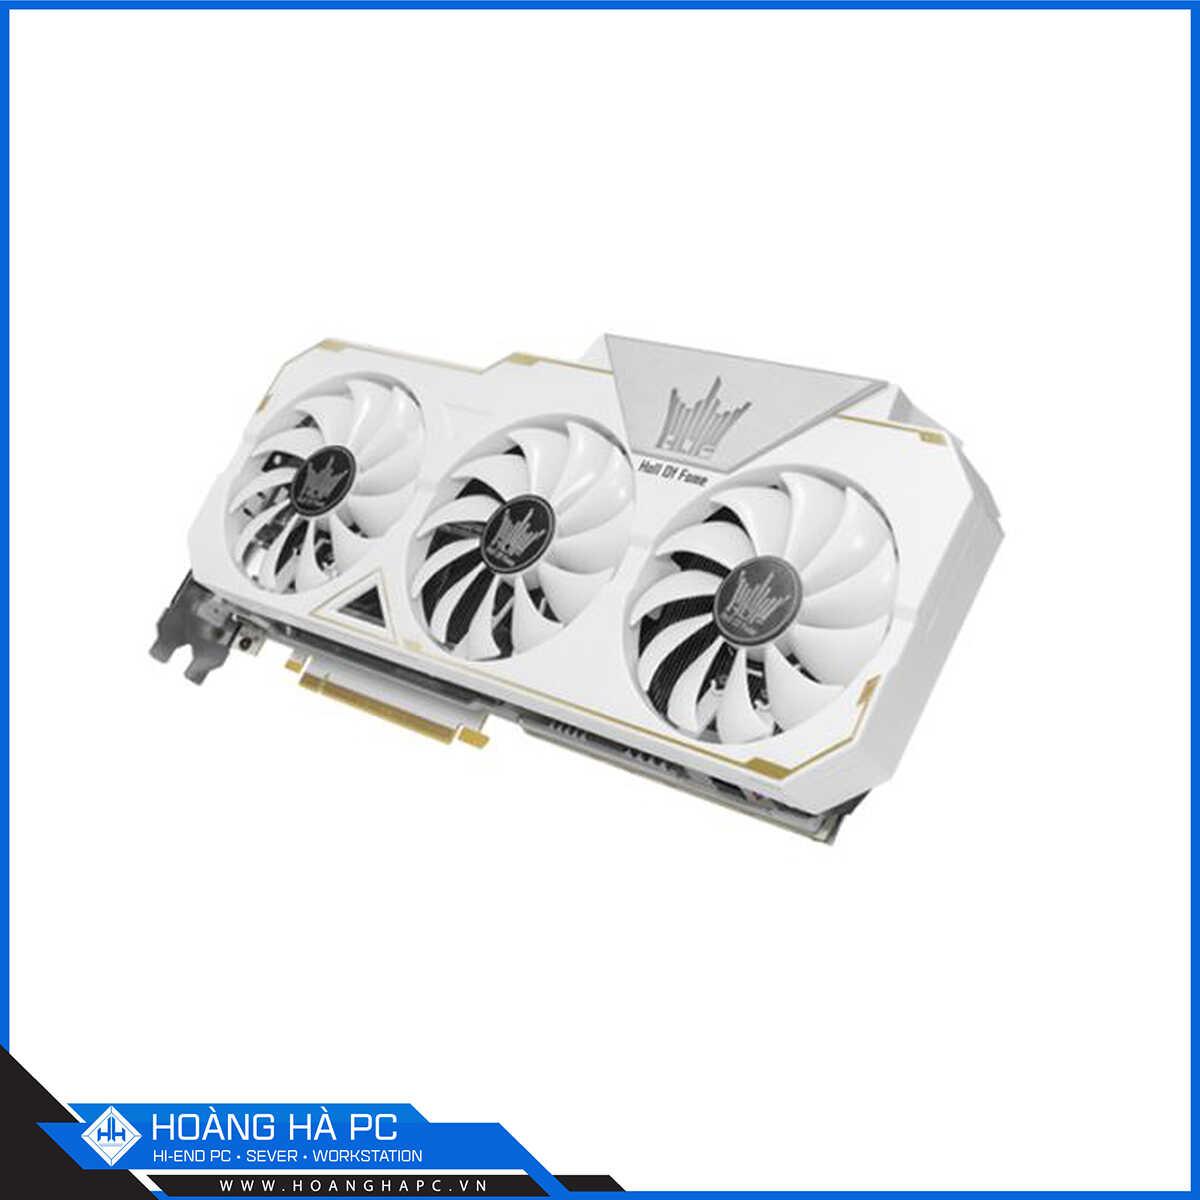 Galax RTX 2080Ti Hall Of Fame 11G White